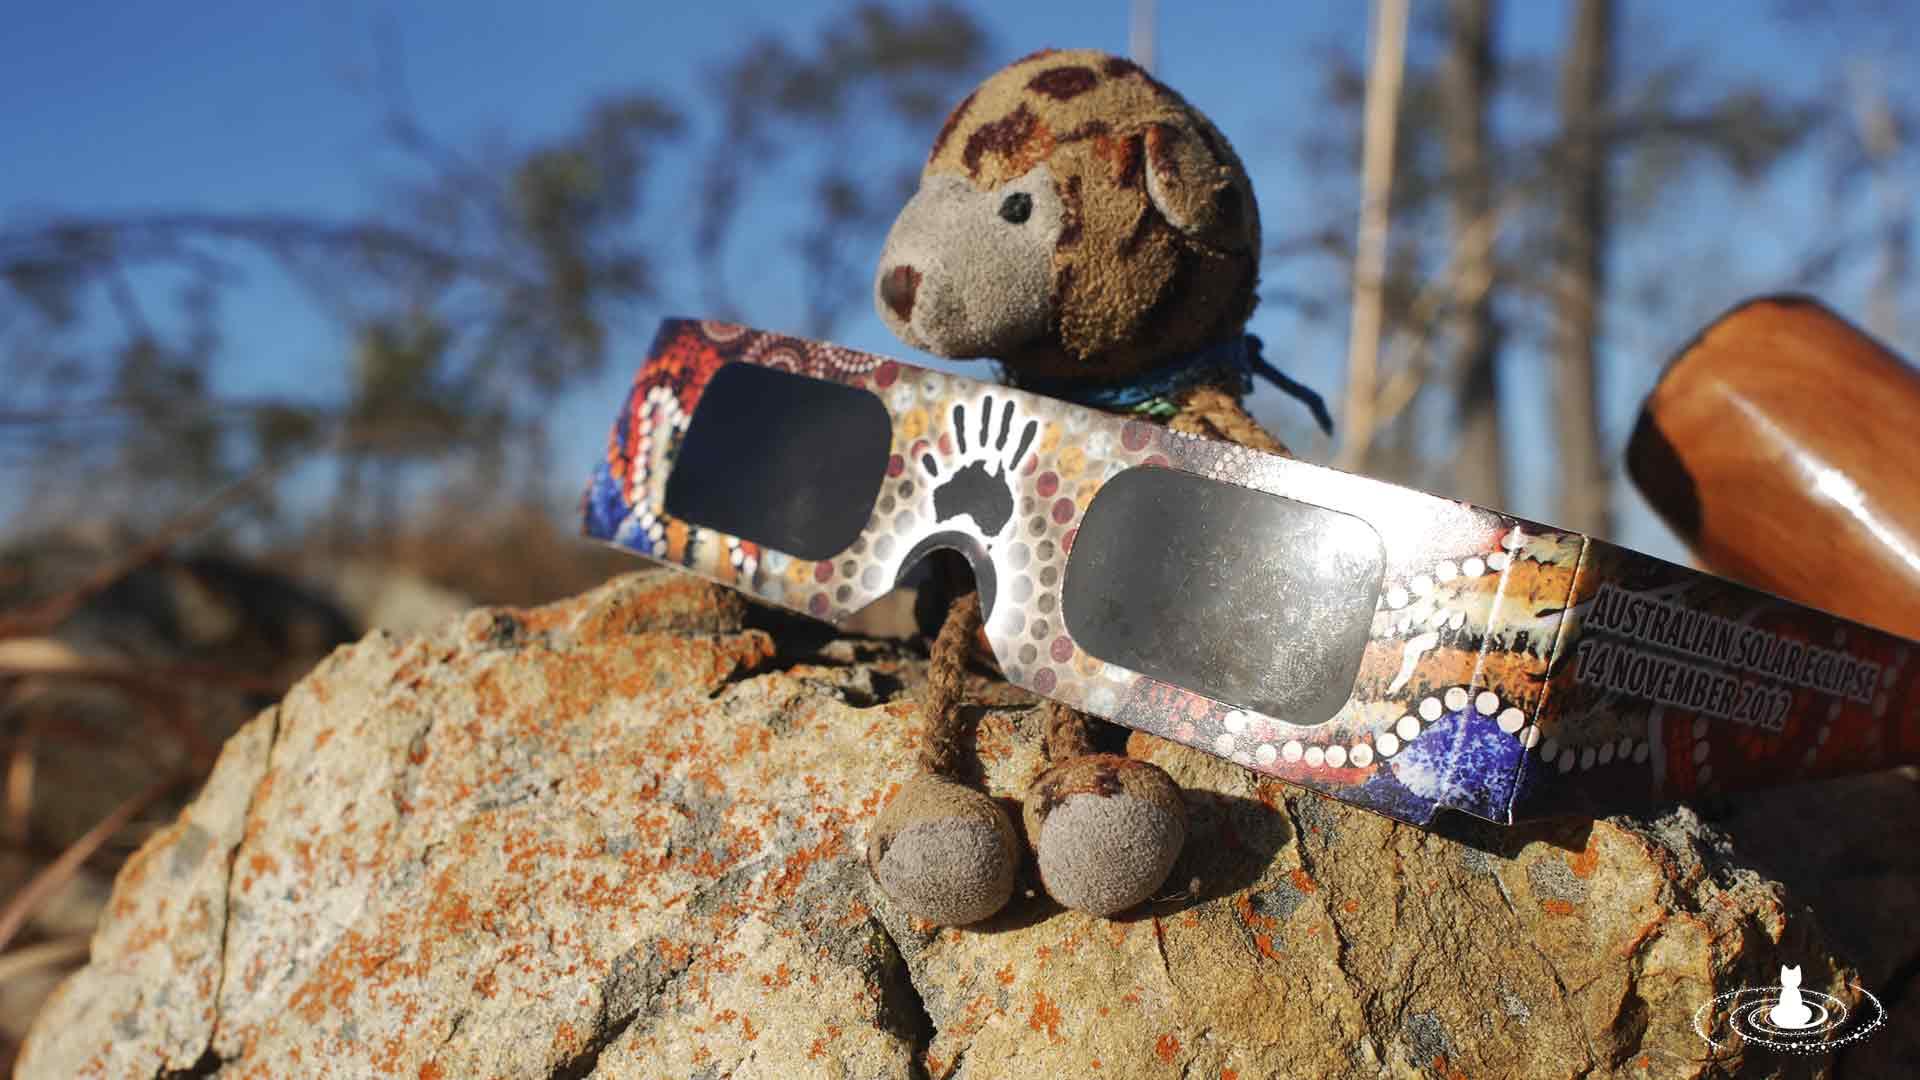 Eclipse Cairns, Australia 2012. Chito